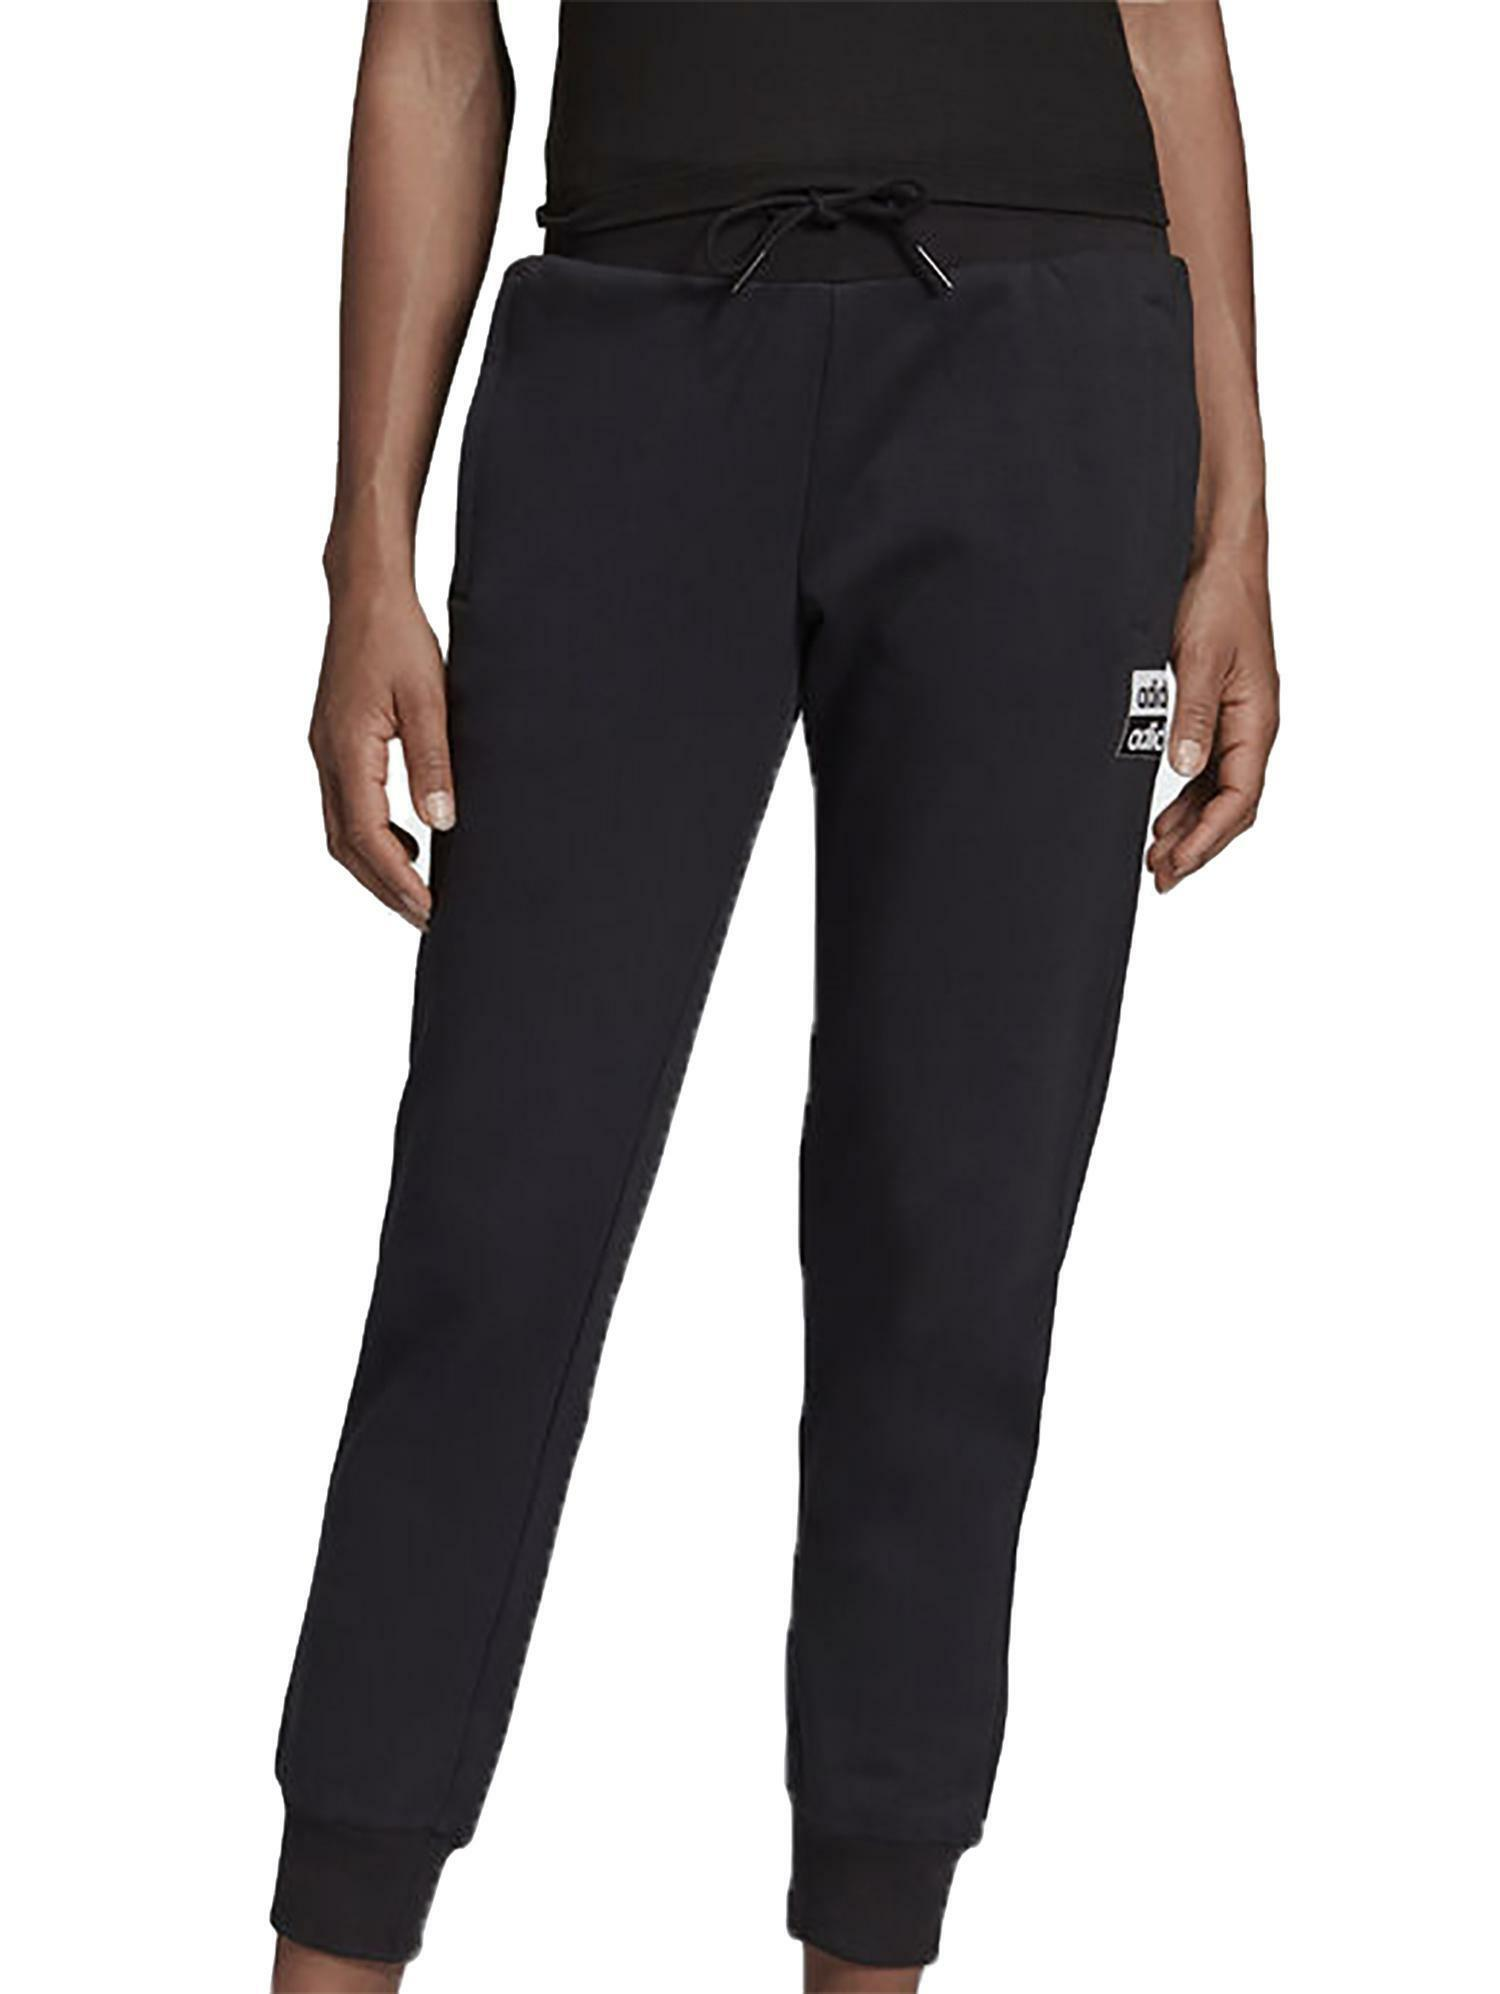 pantaloni adidas donna acetato